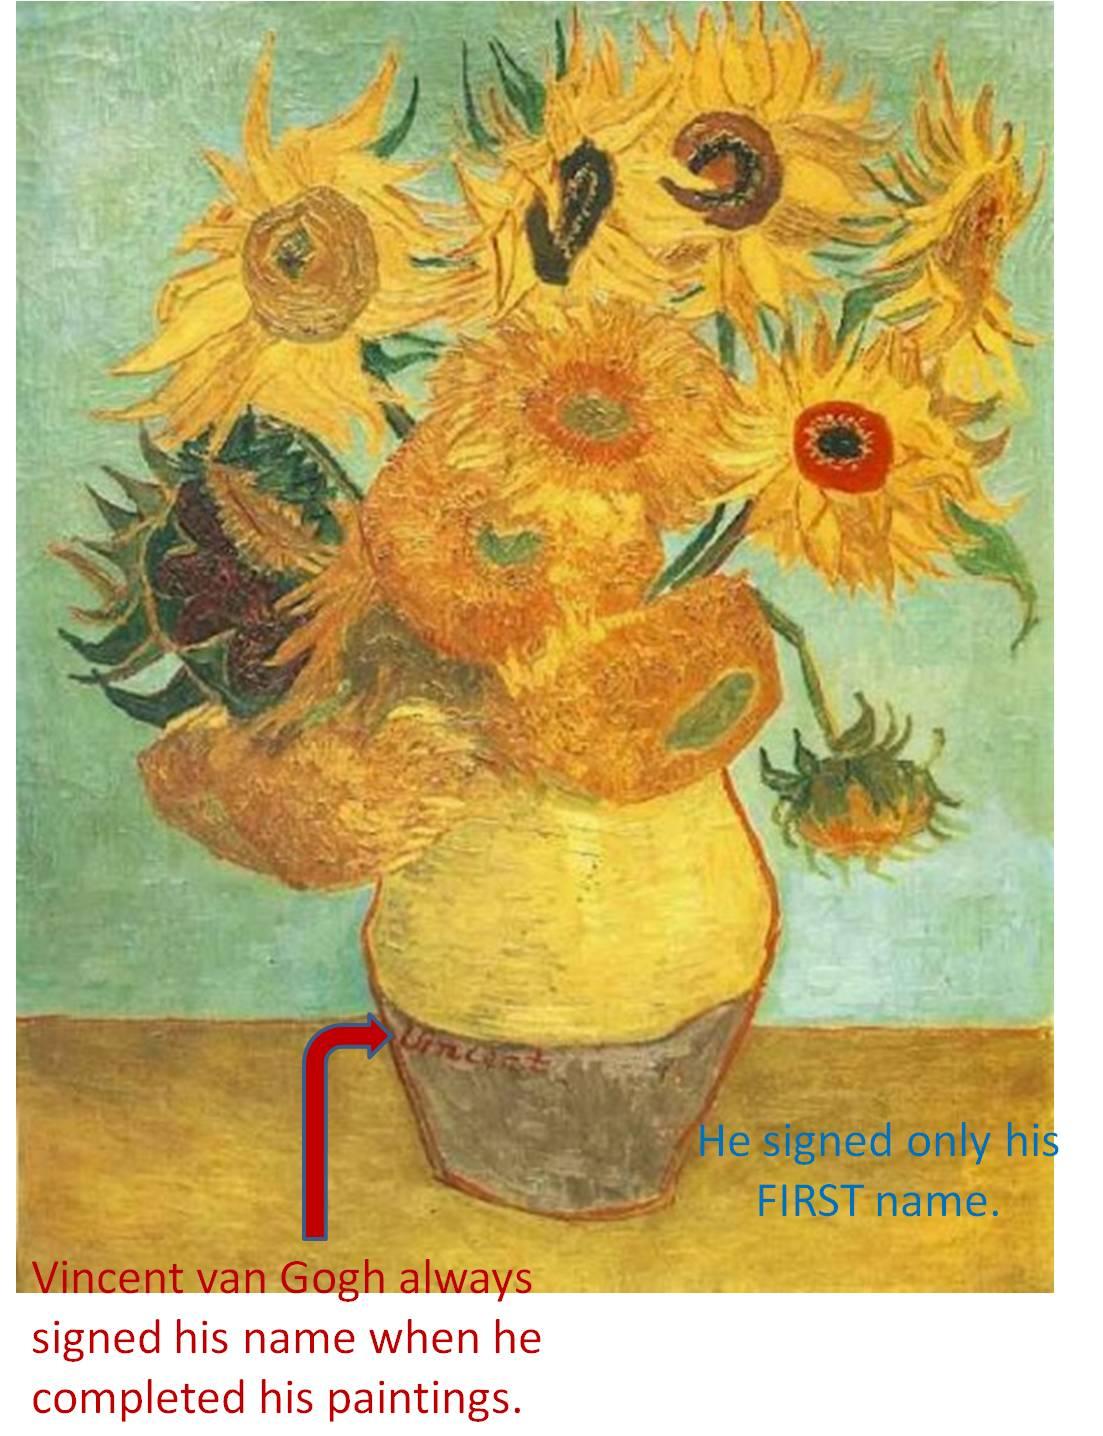 Lot of 6 Vincent Van Gogh Sothebys Impressionist Monet Renoir Modern Art Books